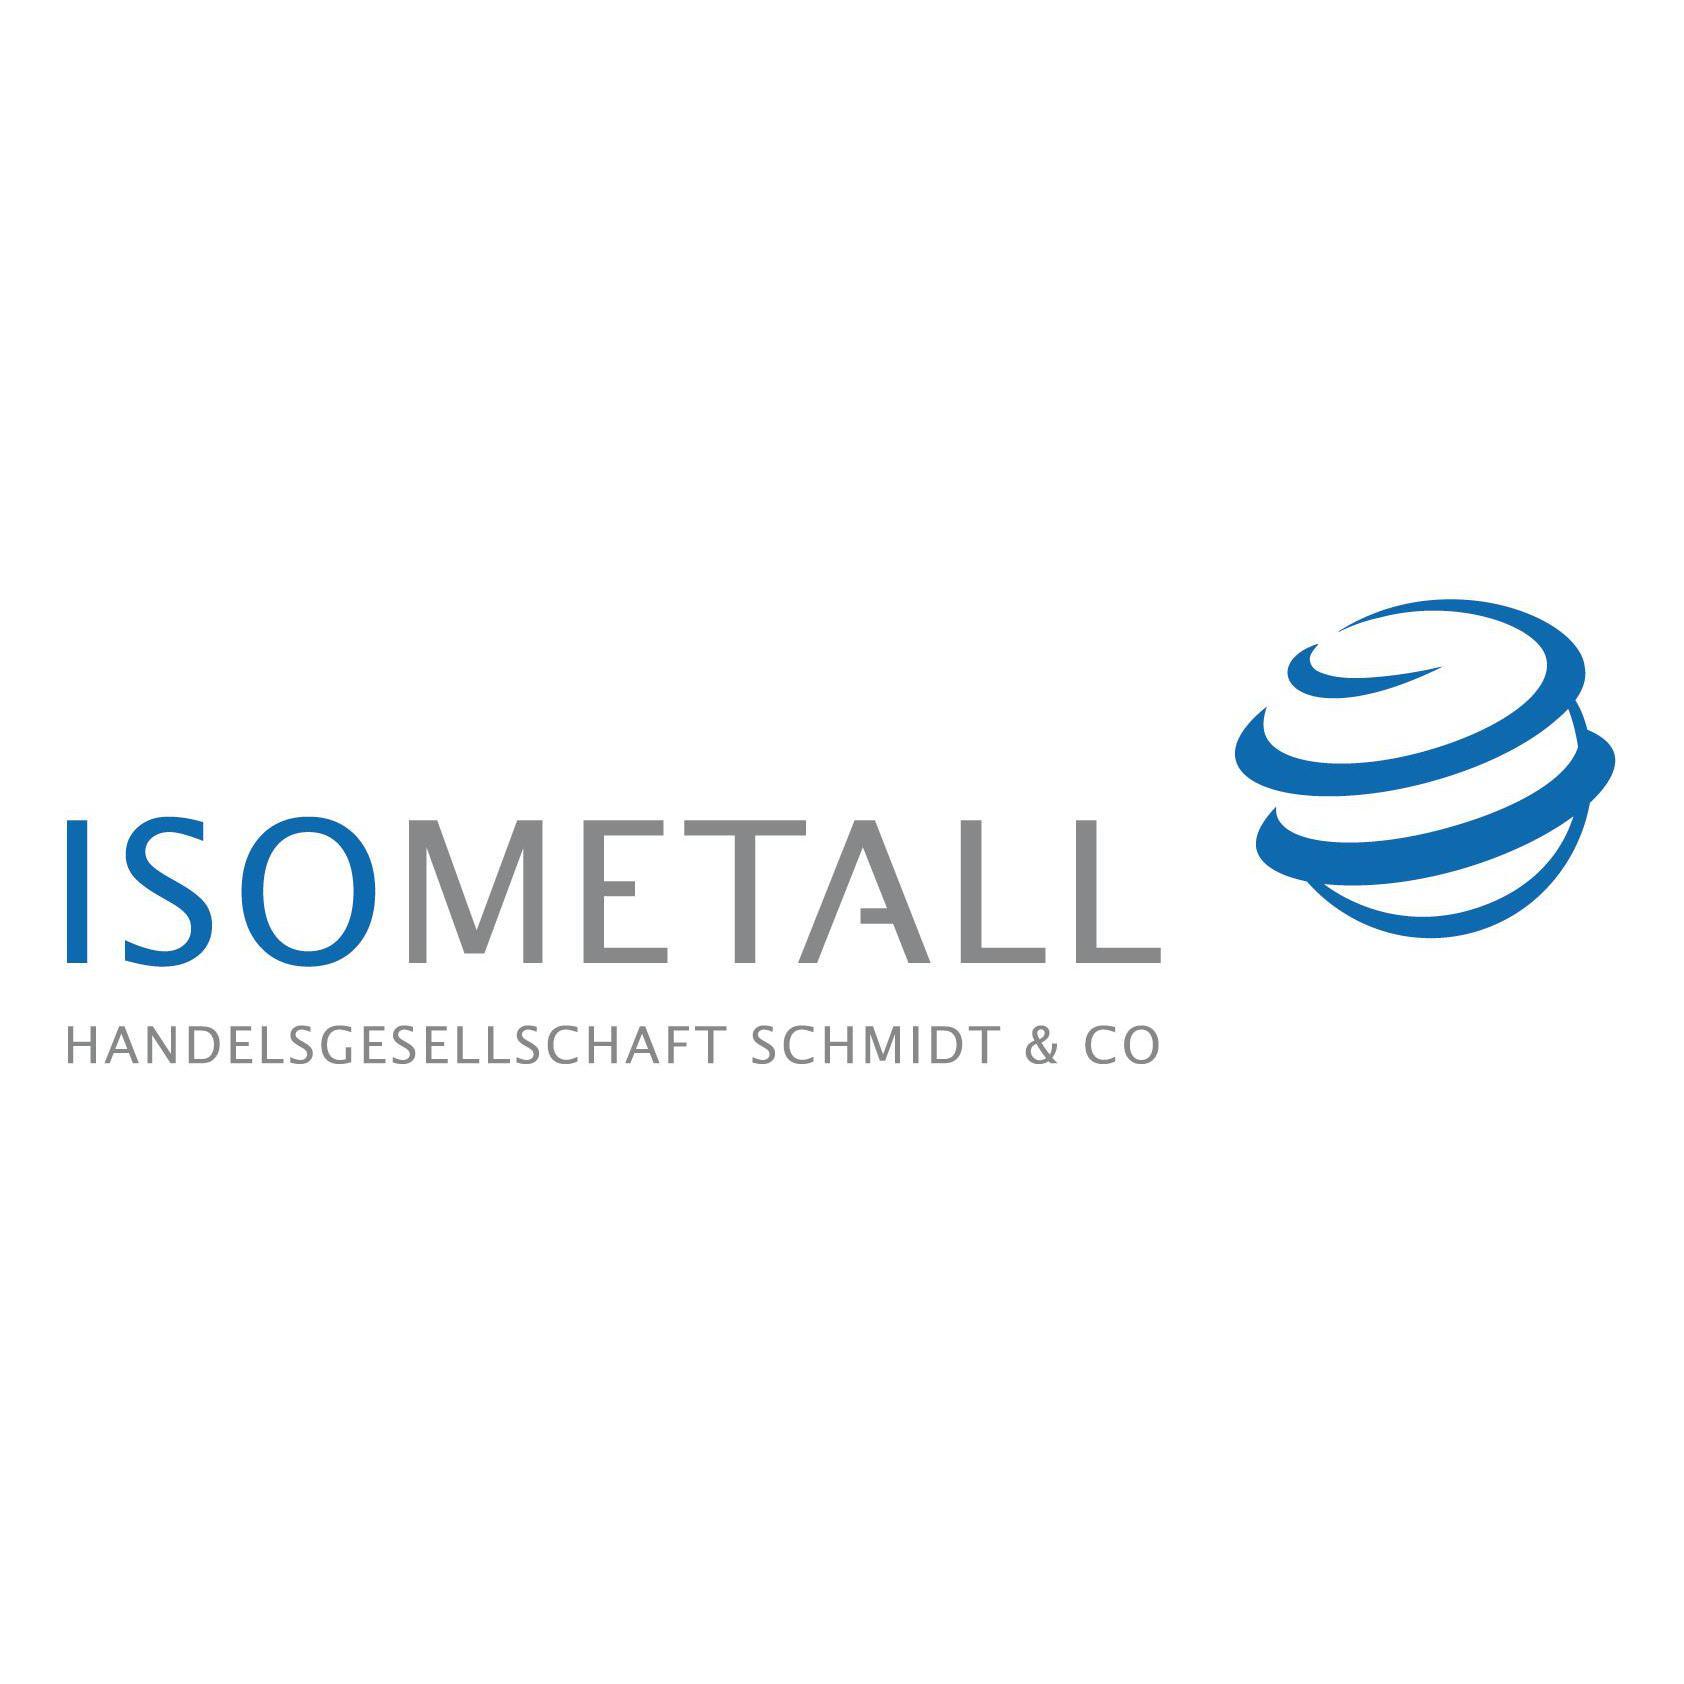 Bild zu ISOMETALL Handelsgesellschaft Schmidt. u. Co. in Pleidelsheim